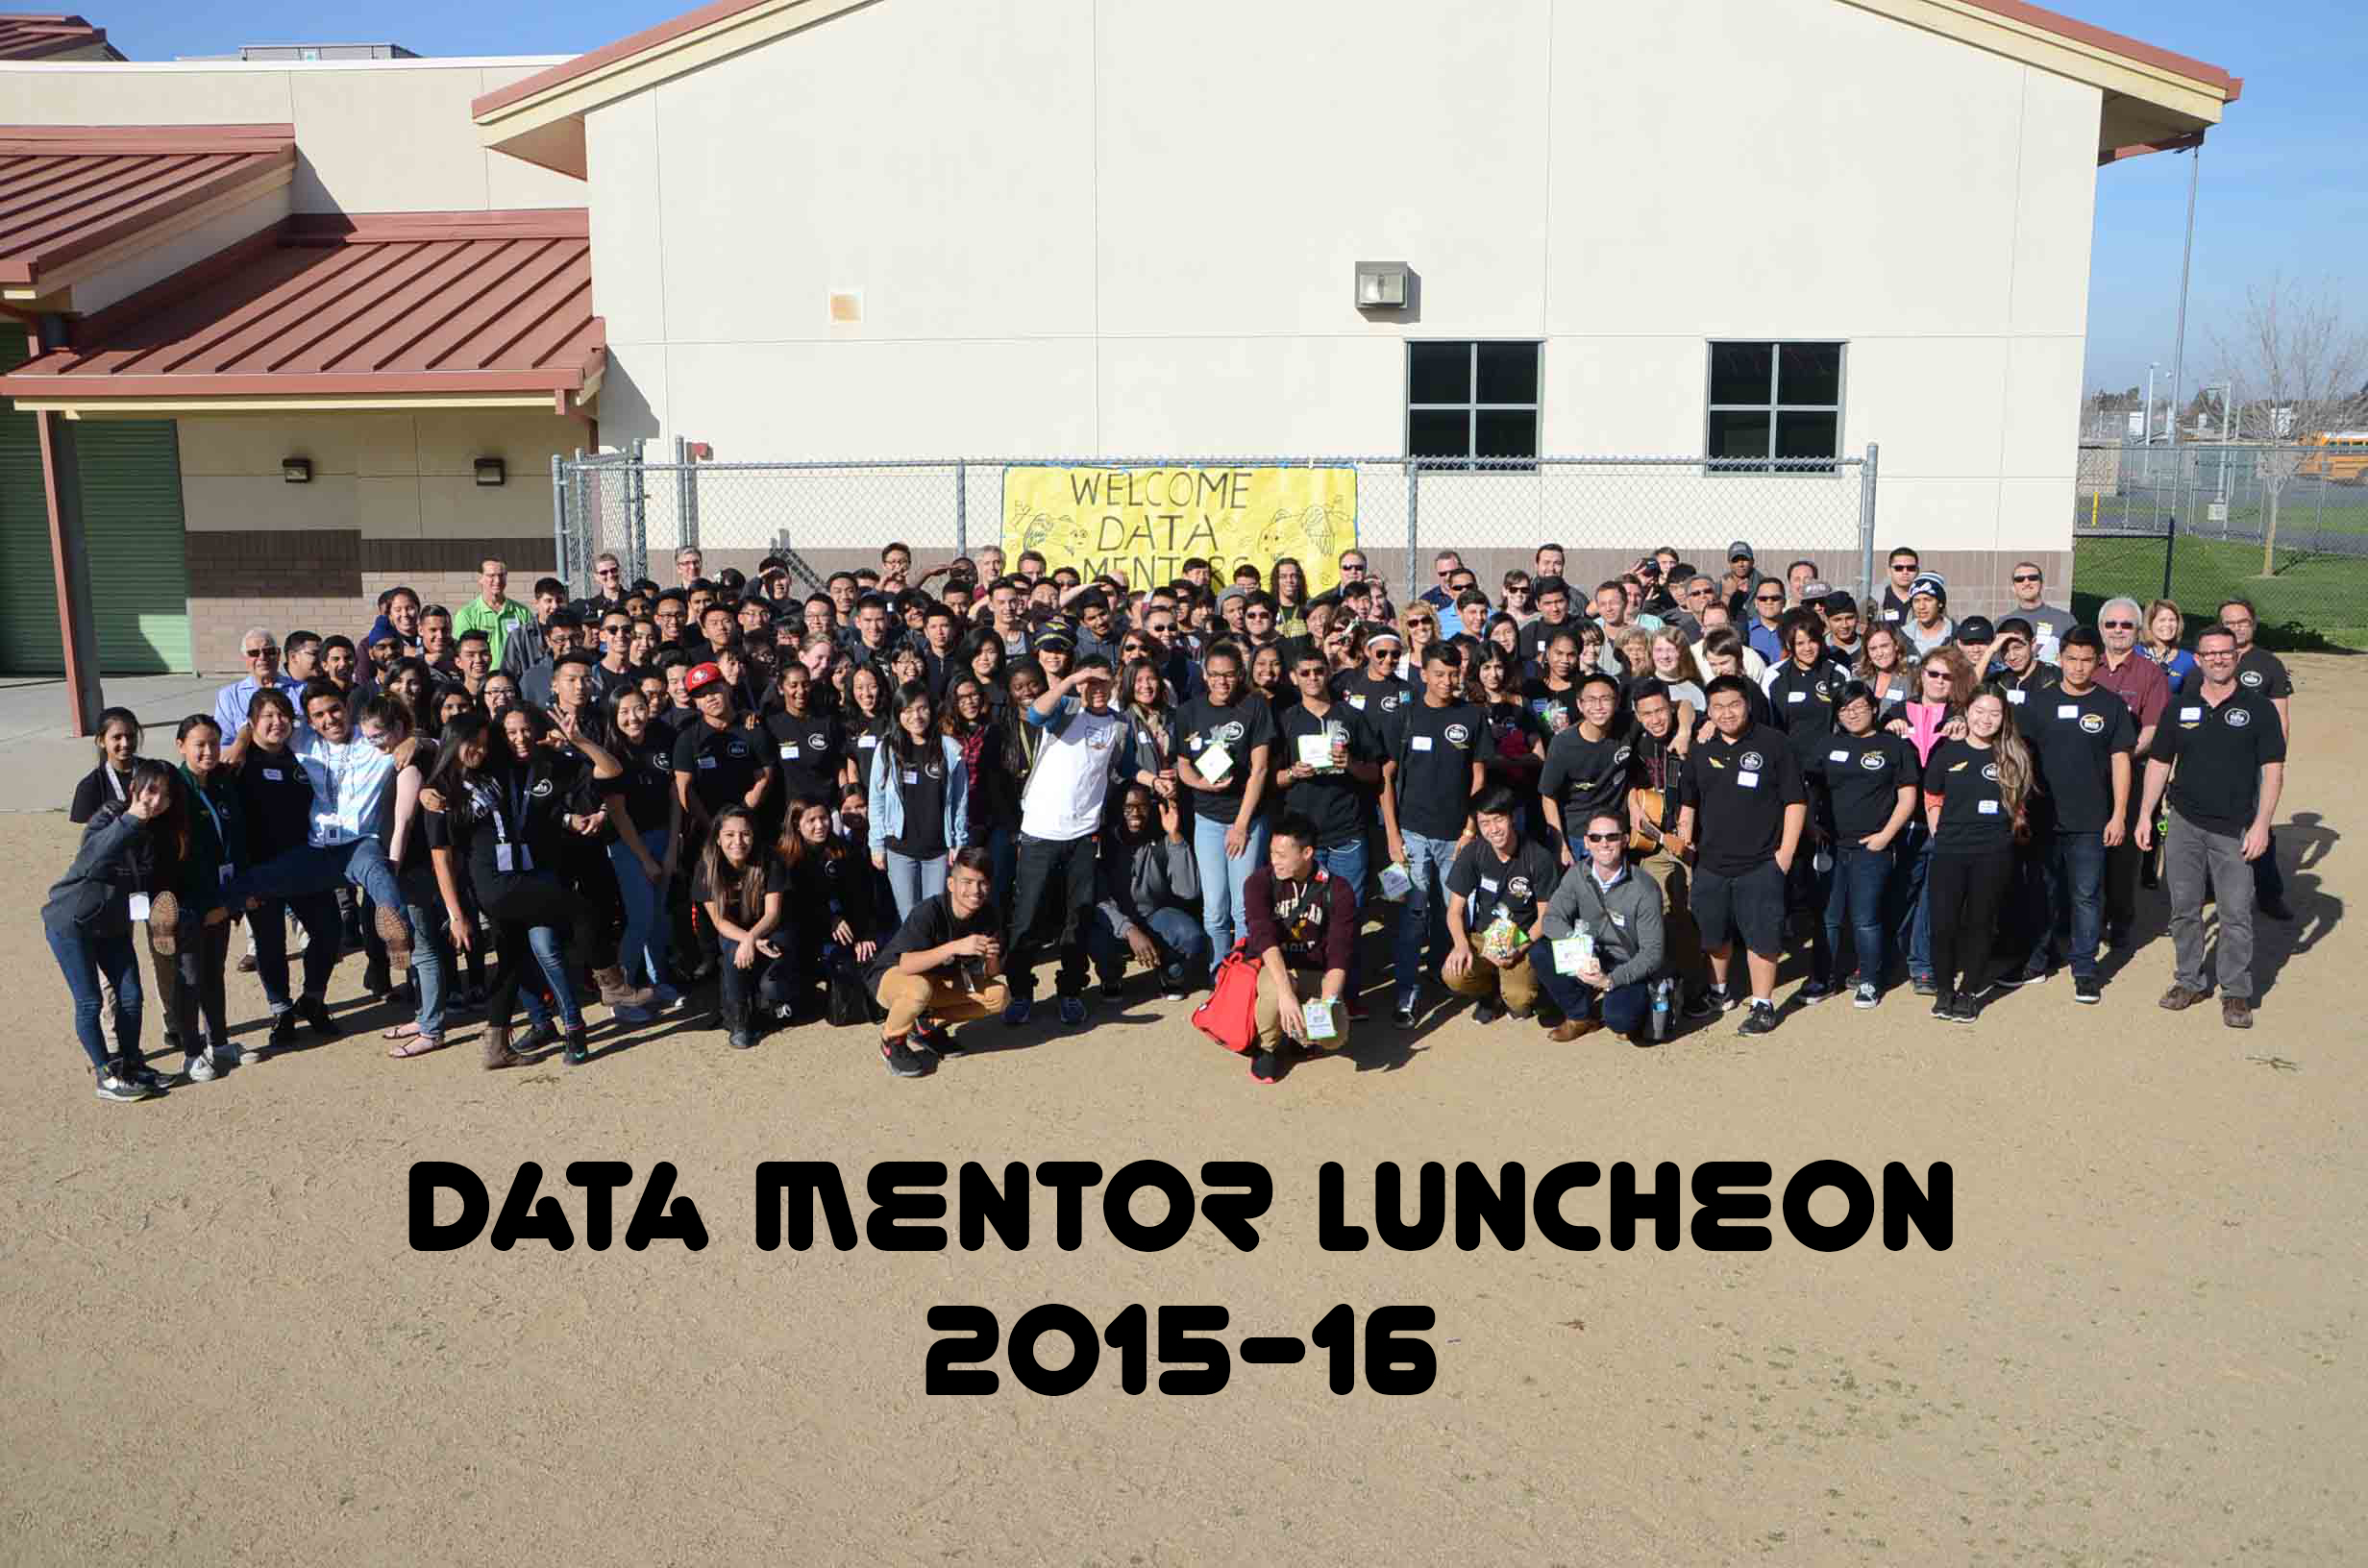 mths-data-mentor-luncheon-2-23-16-rev2